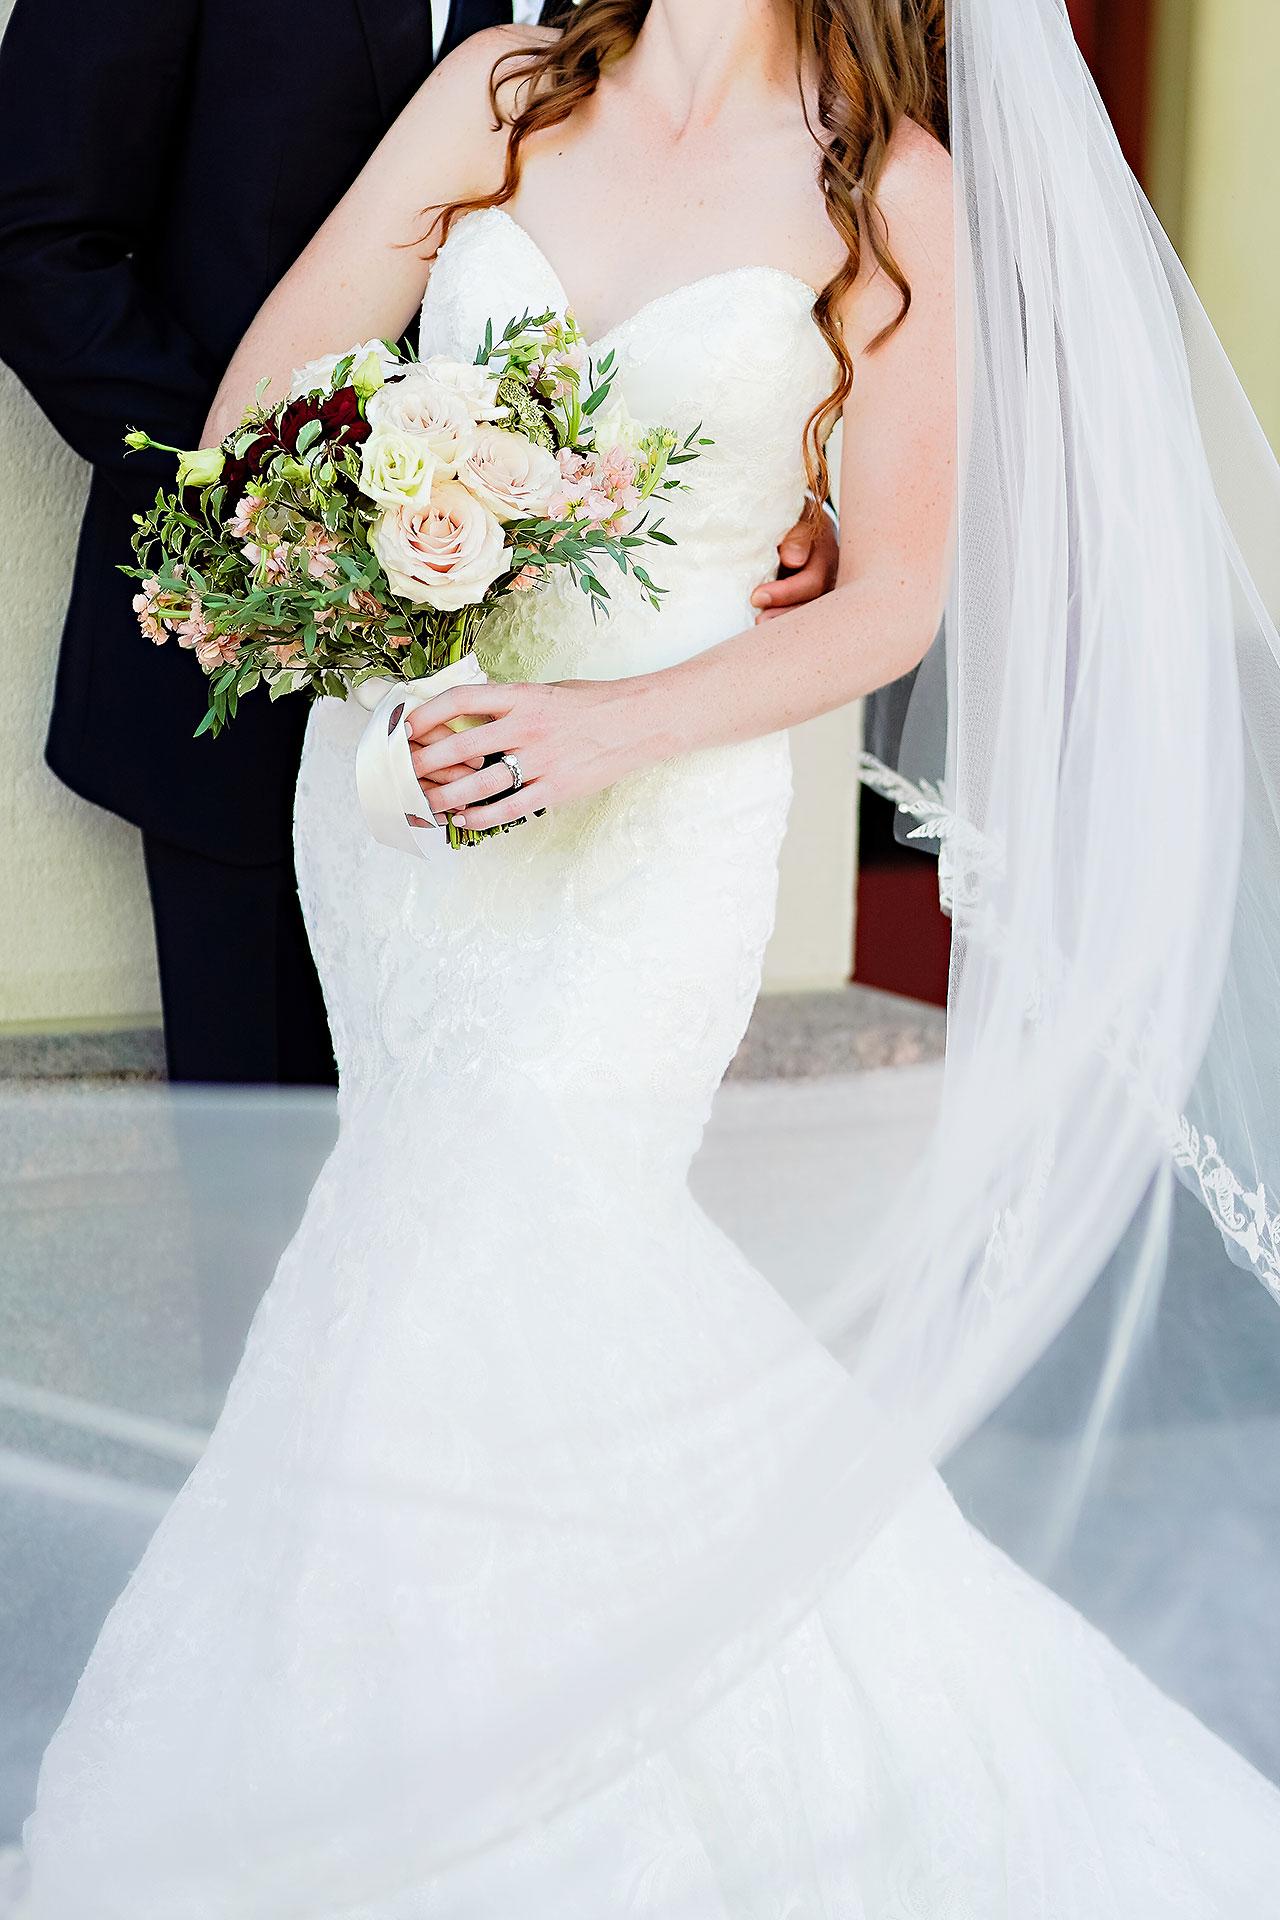 Callie Josh Ritz Charles Garden Pavilion Carmel Indiana Wedding 127